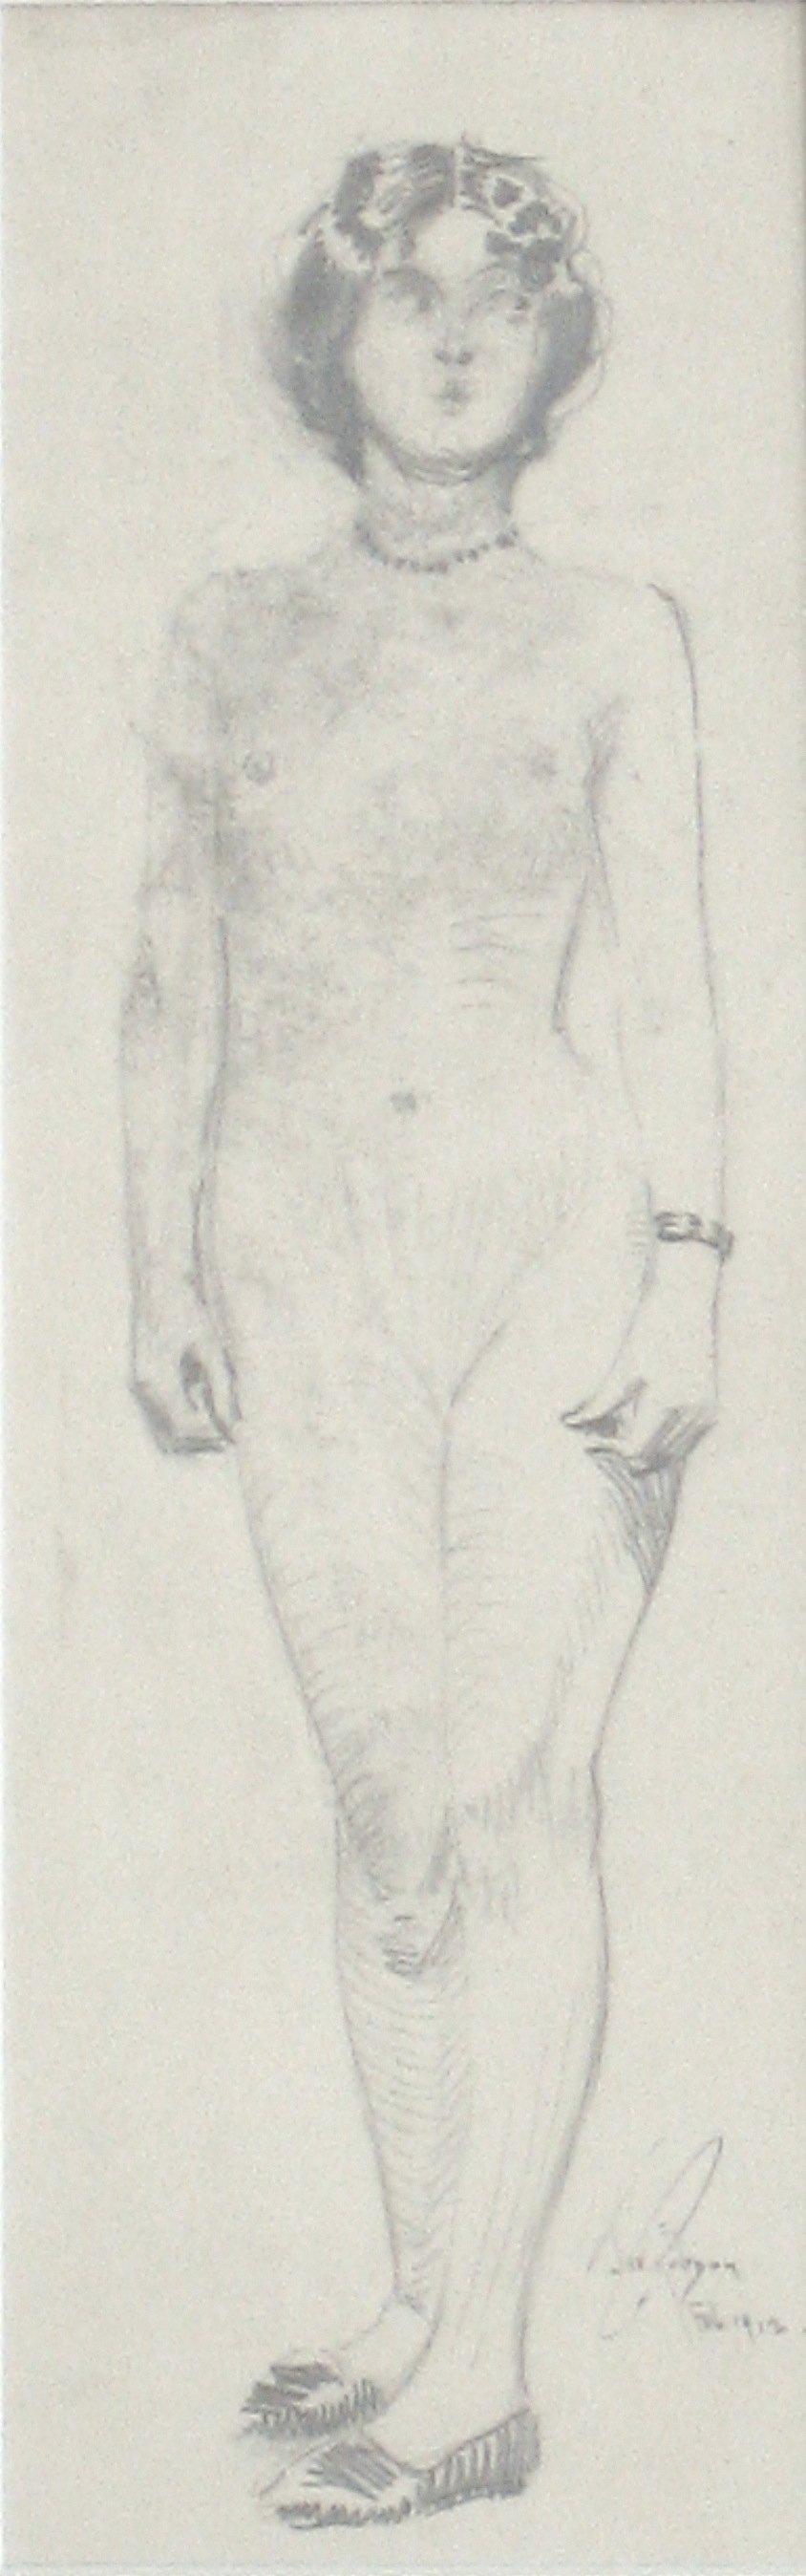 Standing Parisian Female Nude Graphite Drawing 1912